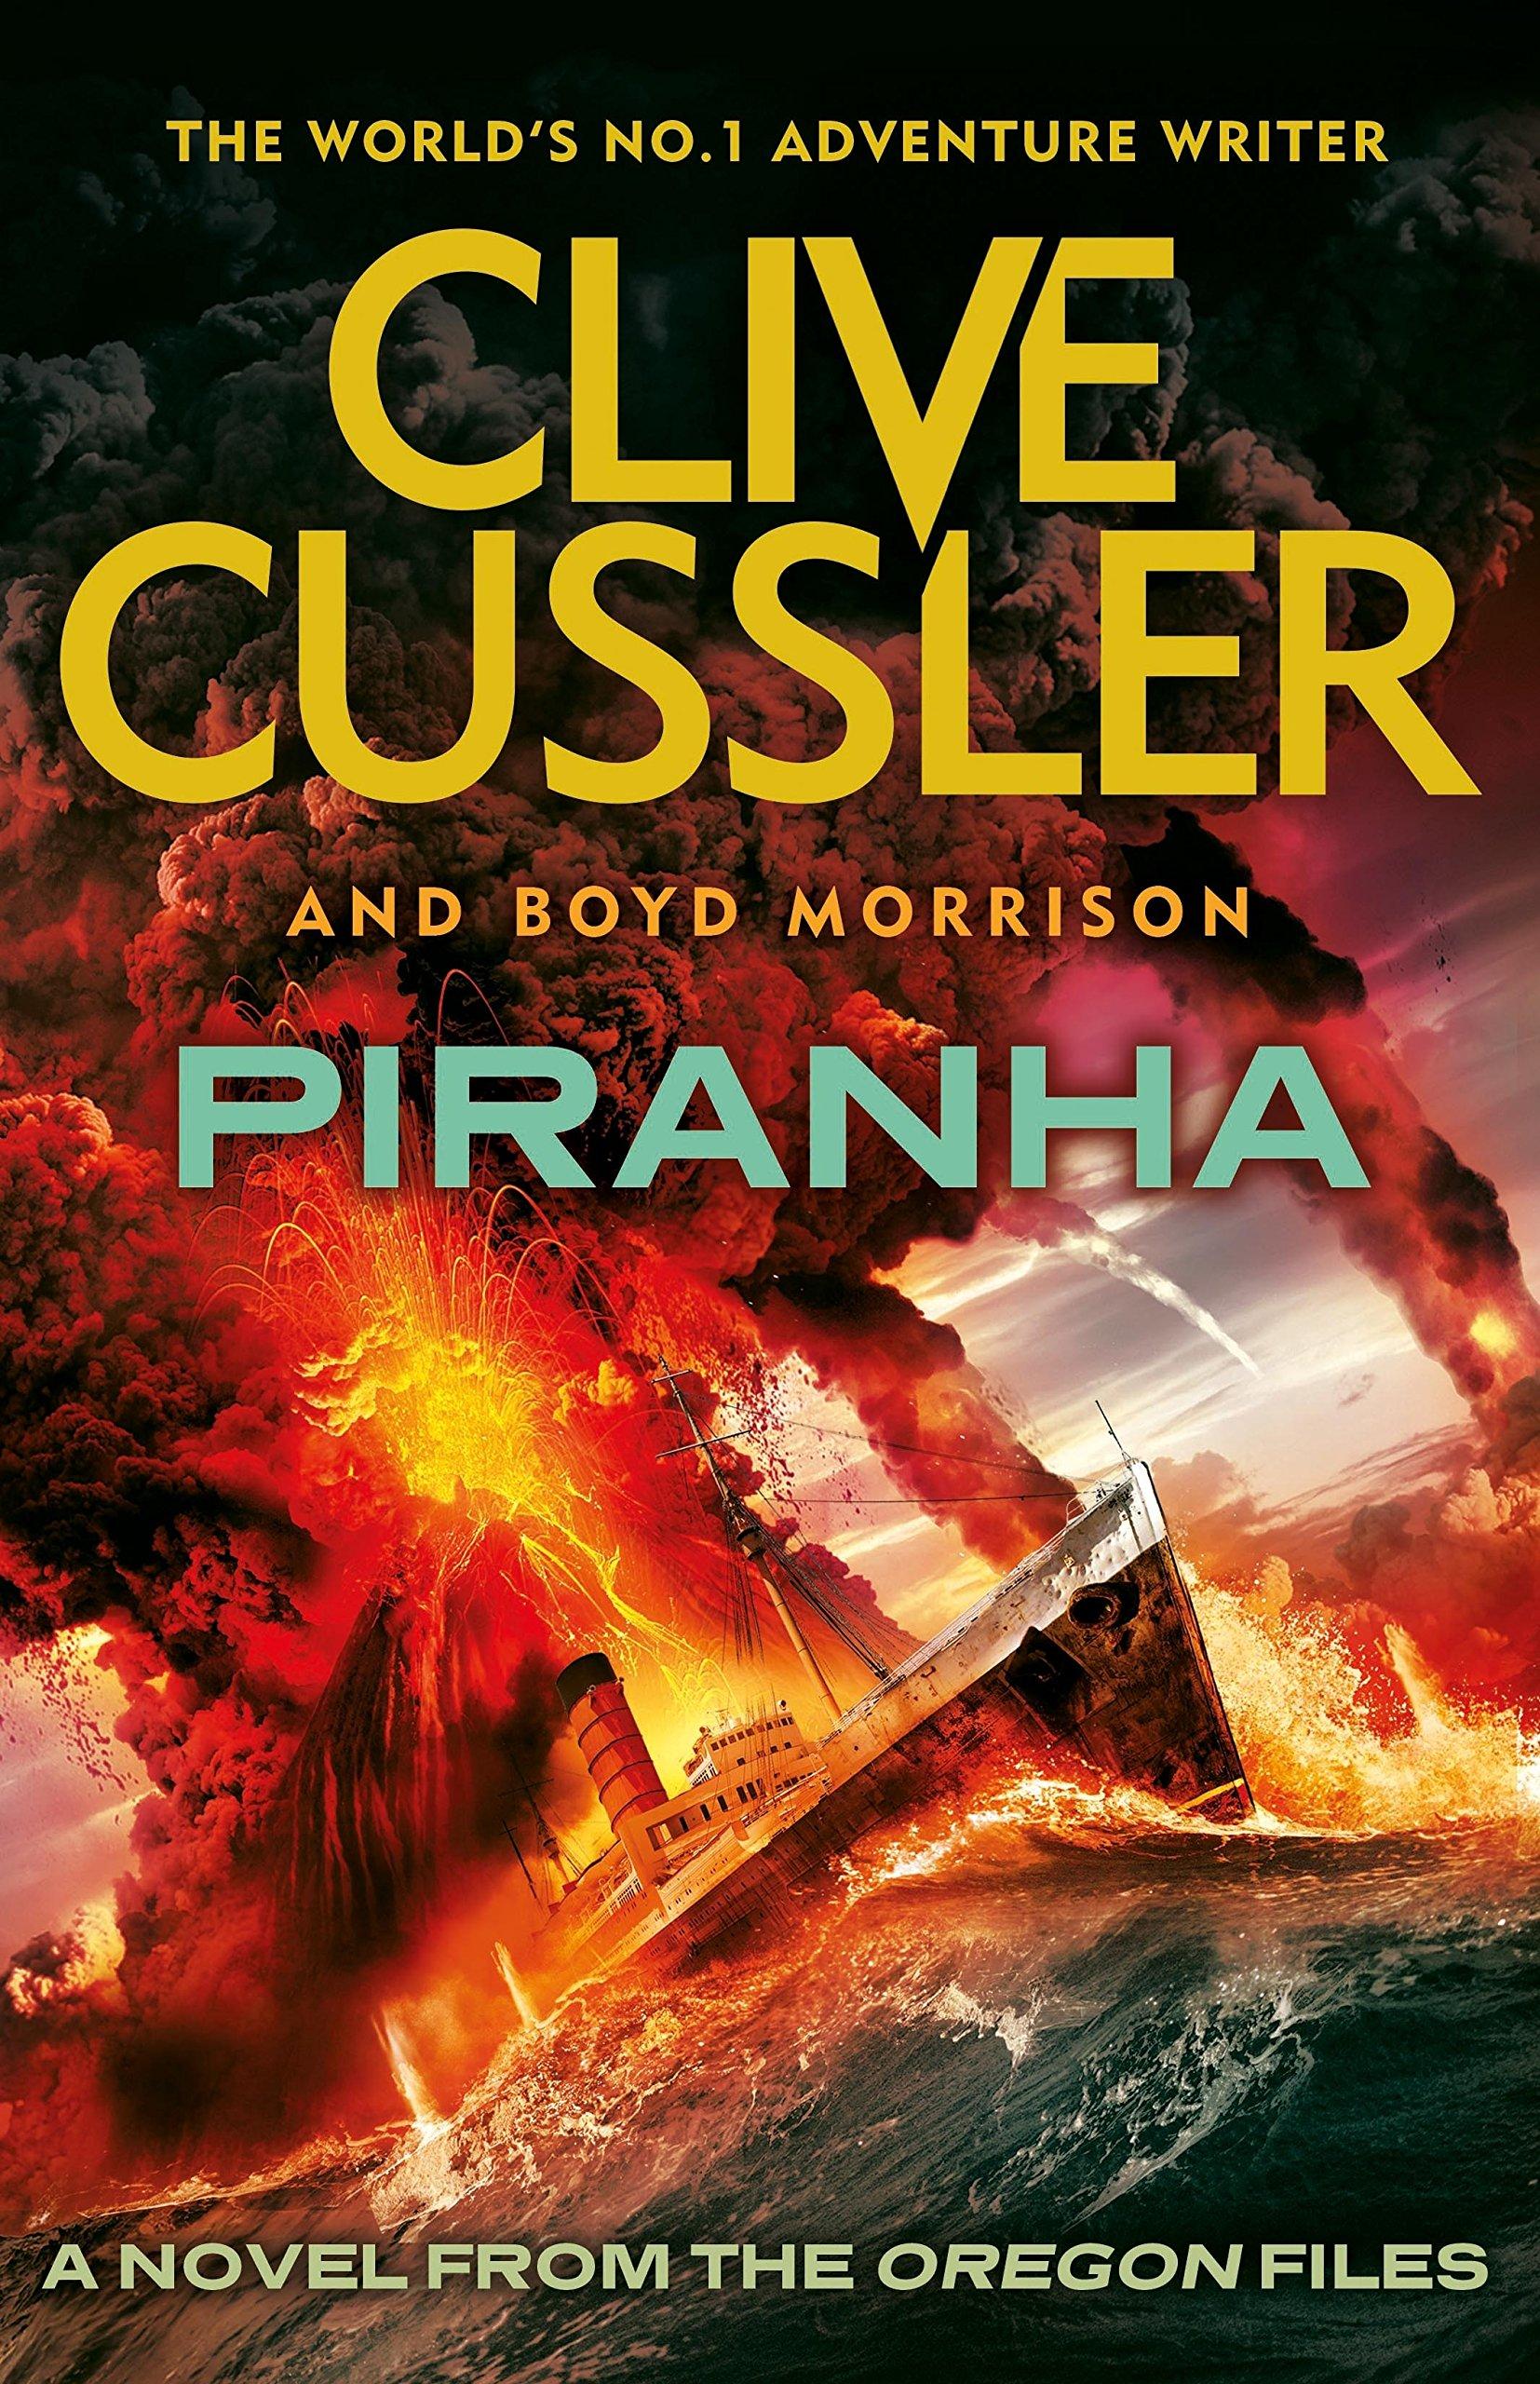 Piranha: Oregon Files #10 (The Oregon Files): Amazon.co.uk: Clive Cussler,  Boyd Morrison: 9780718178741: Books